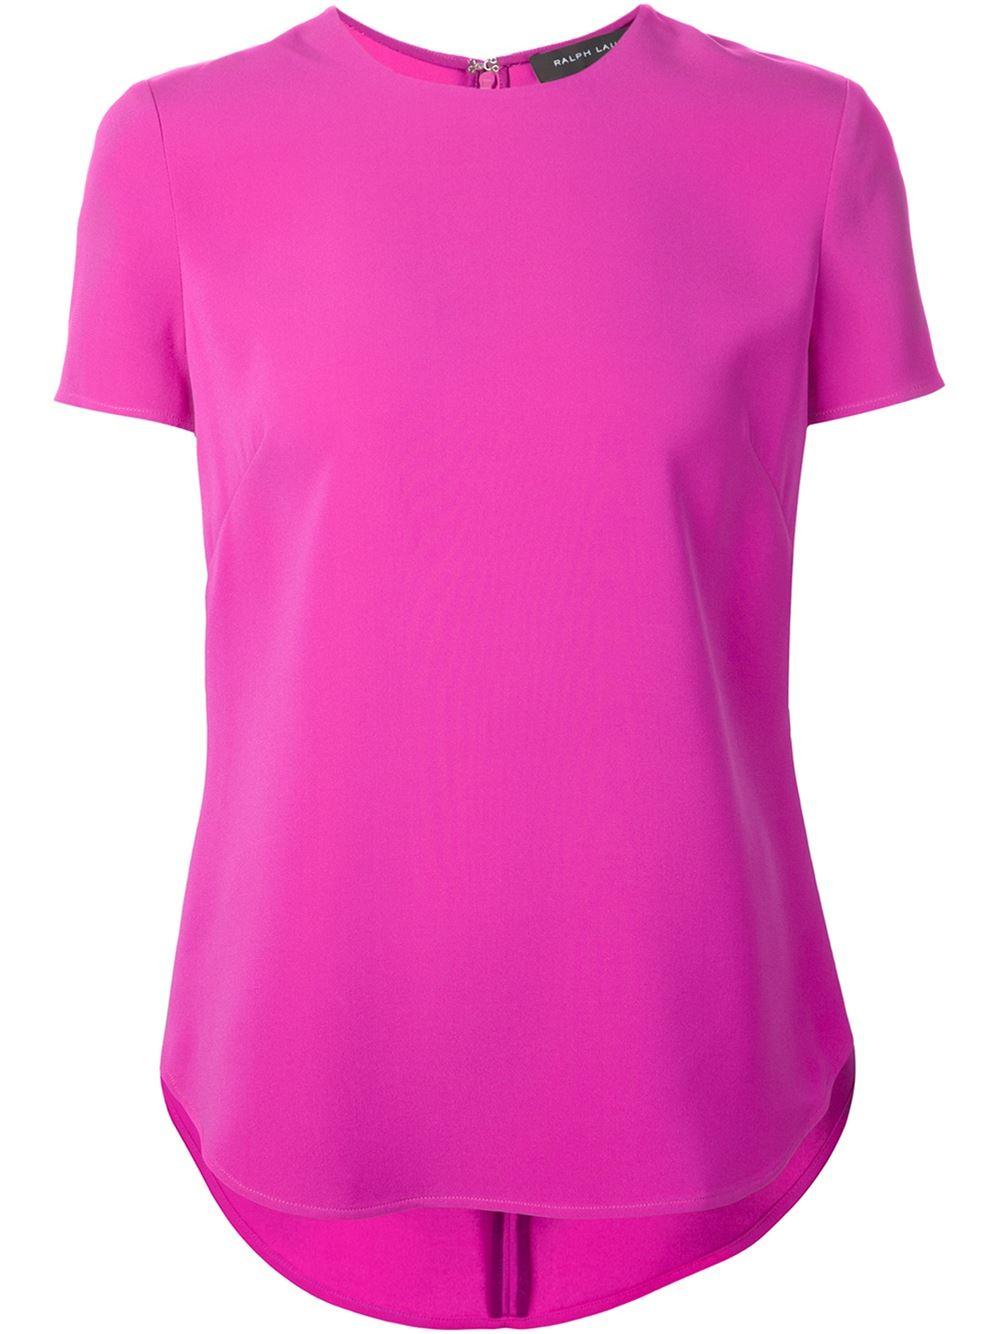 ralph lauren black label short sleeve blouse in pink pink purple lyst. Black Bedroom Furniture Sets. Home Design Ideas